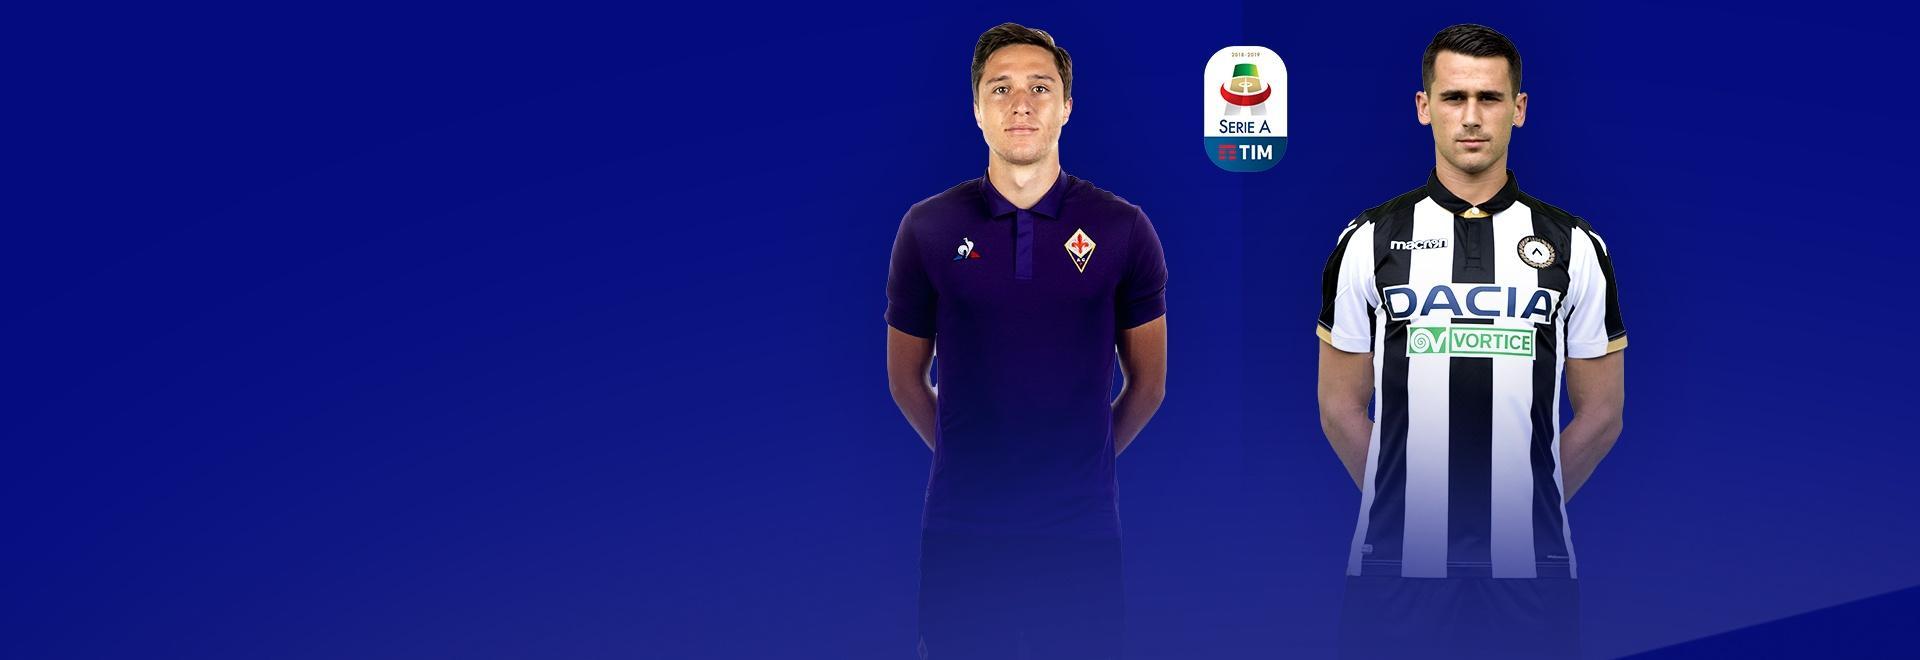 Fiorentina - Udinese. 3a g.